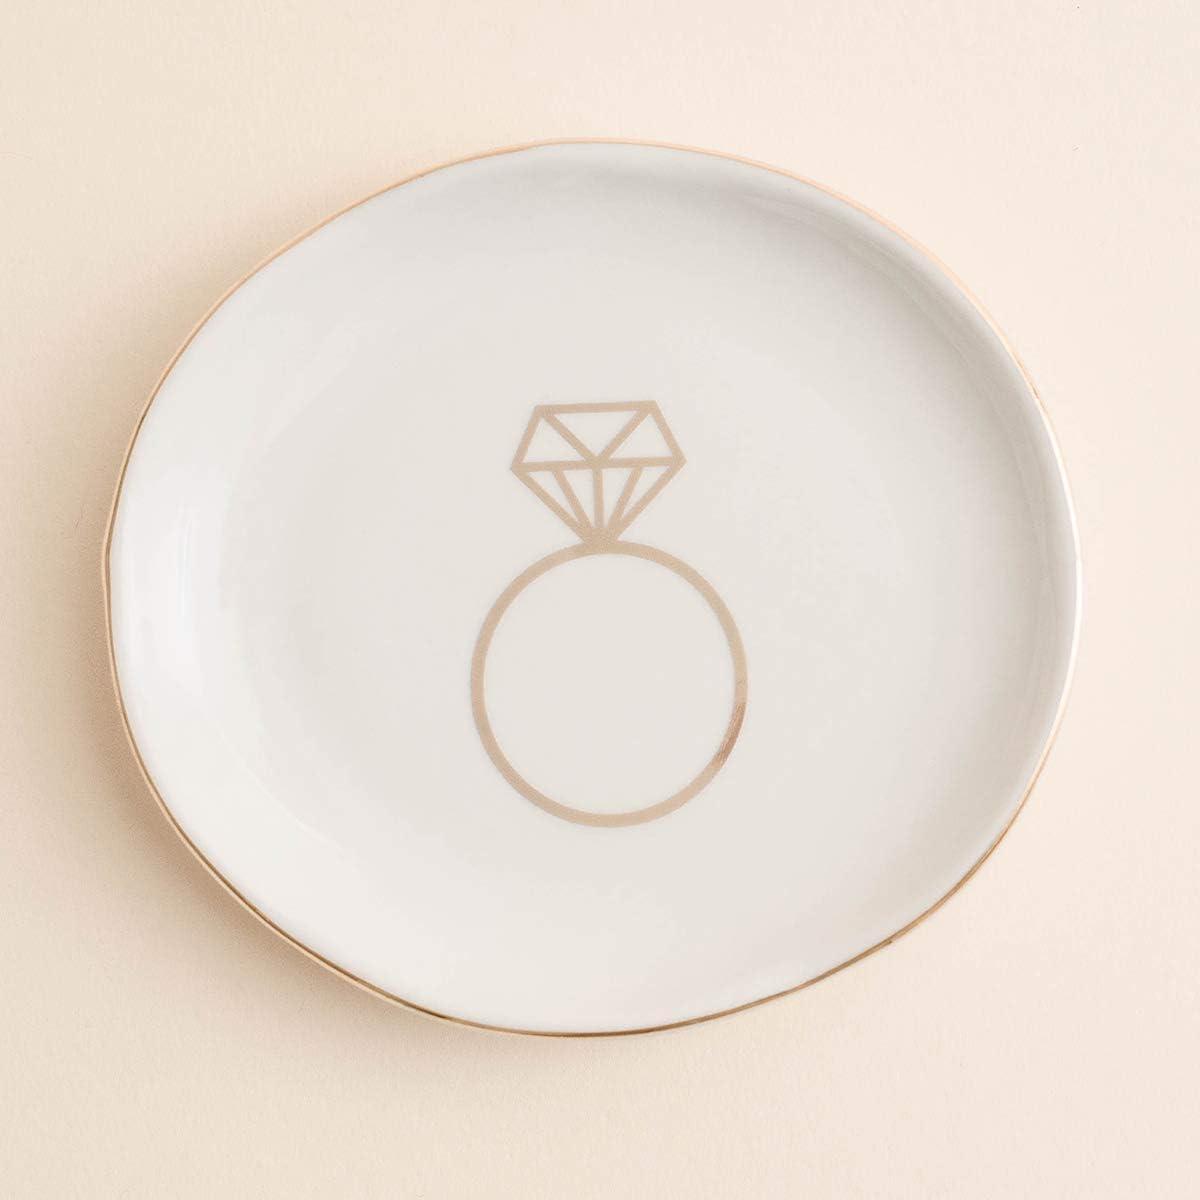 Oval Concrete Trinket Tray BirthdayWeddingAnniversaryBridesmaid Gift Jewellery Tray Home Decor Coaster Ring Dish